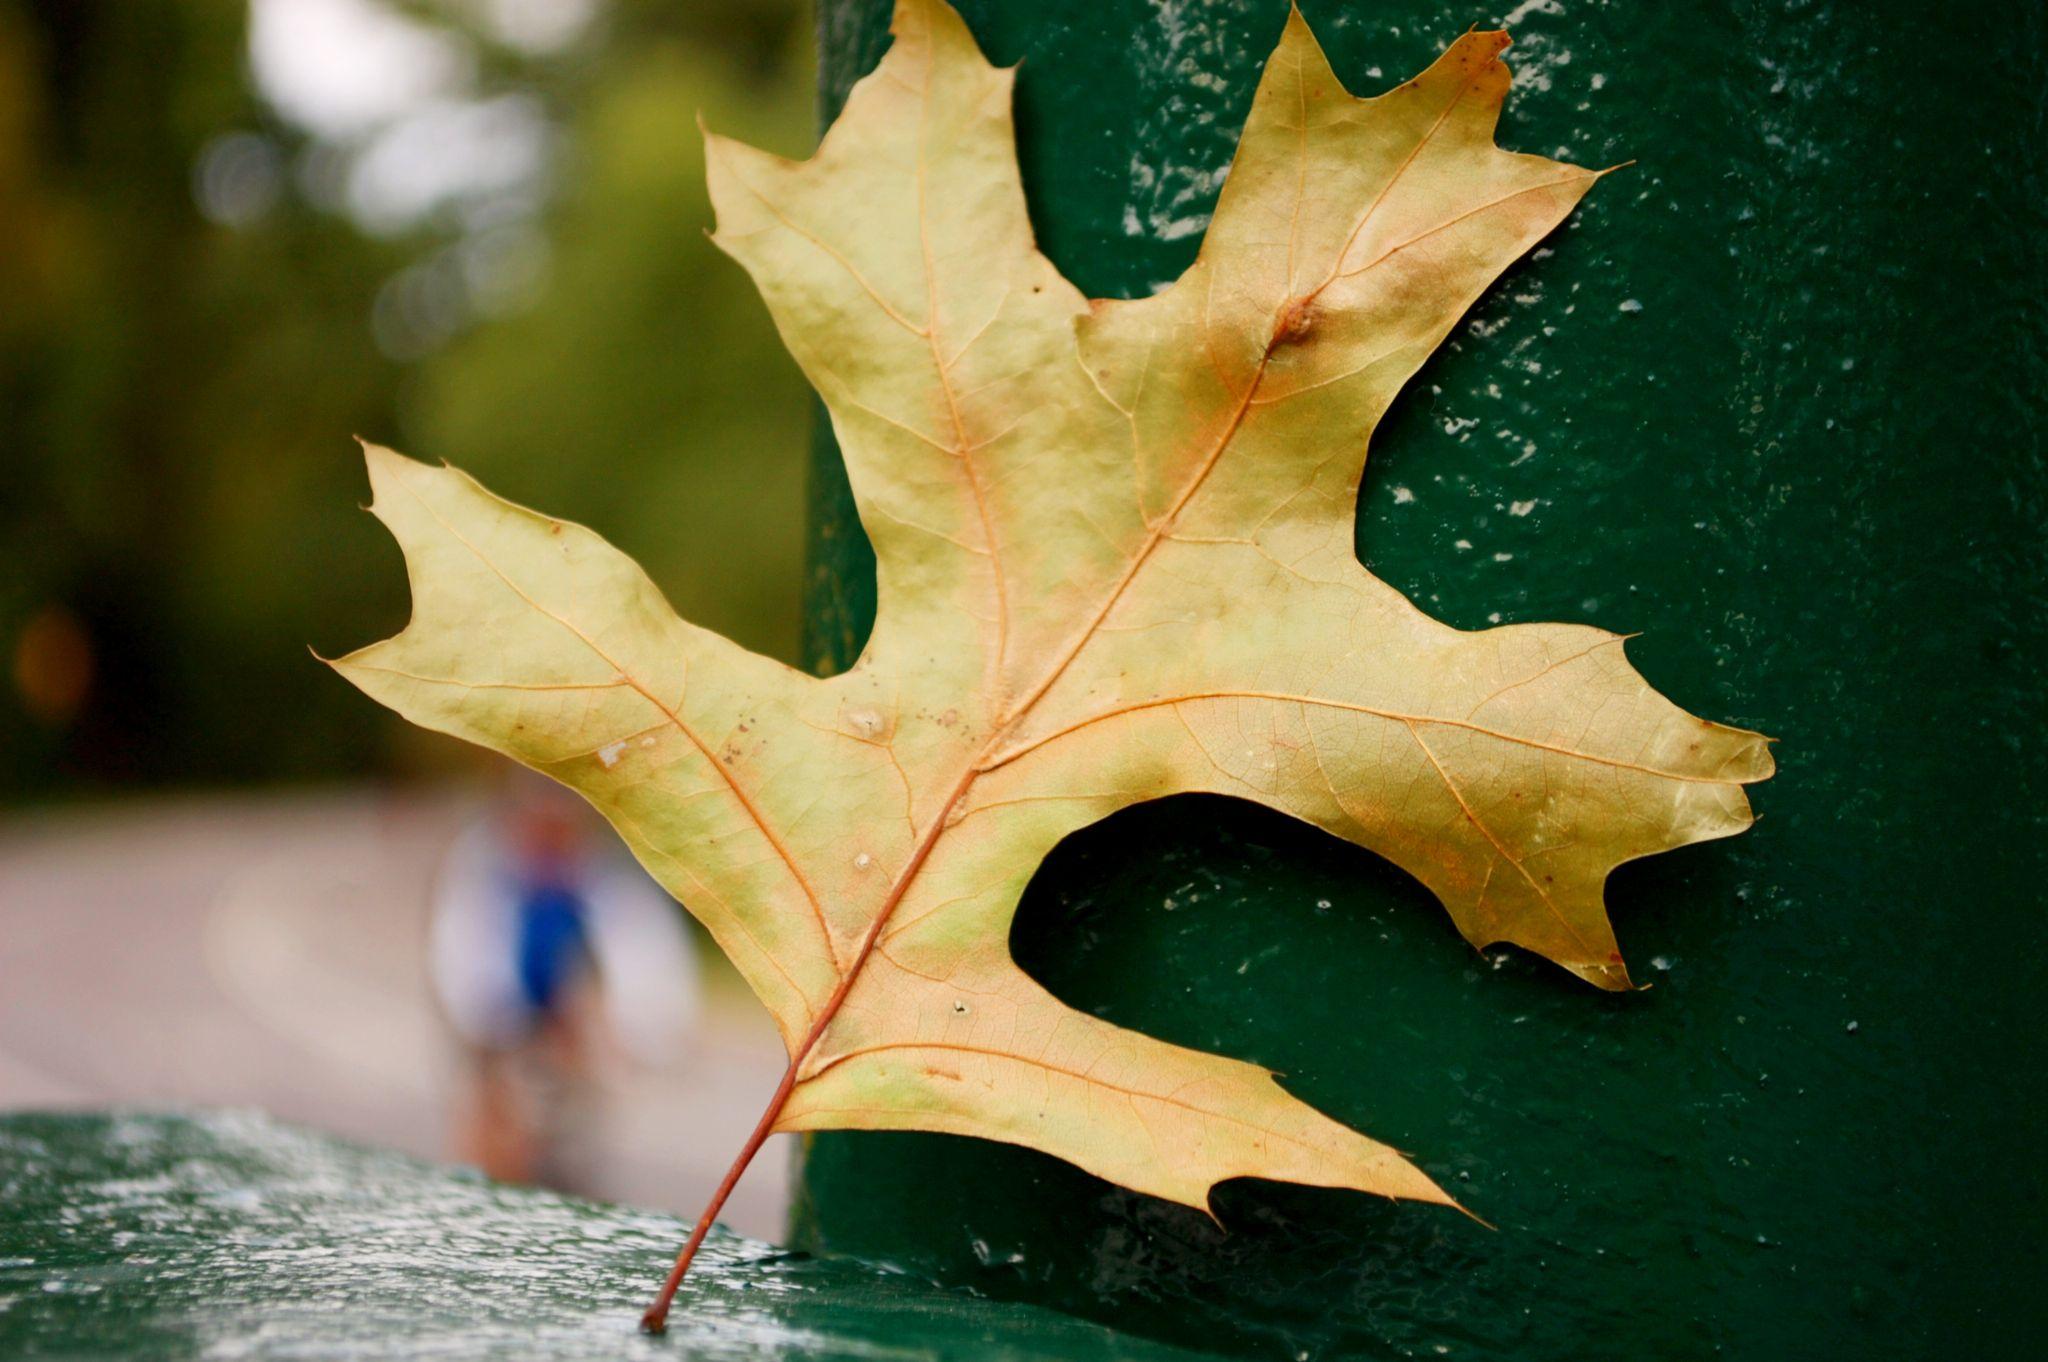 The Last Leaf by Yoko D